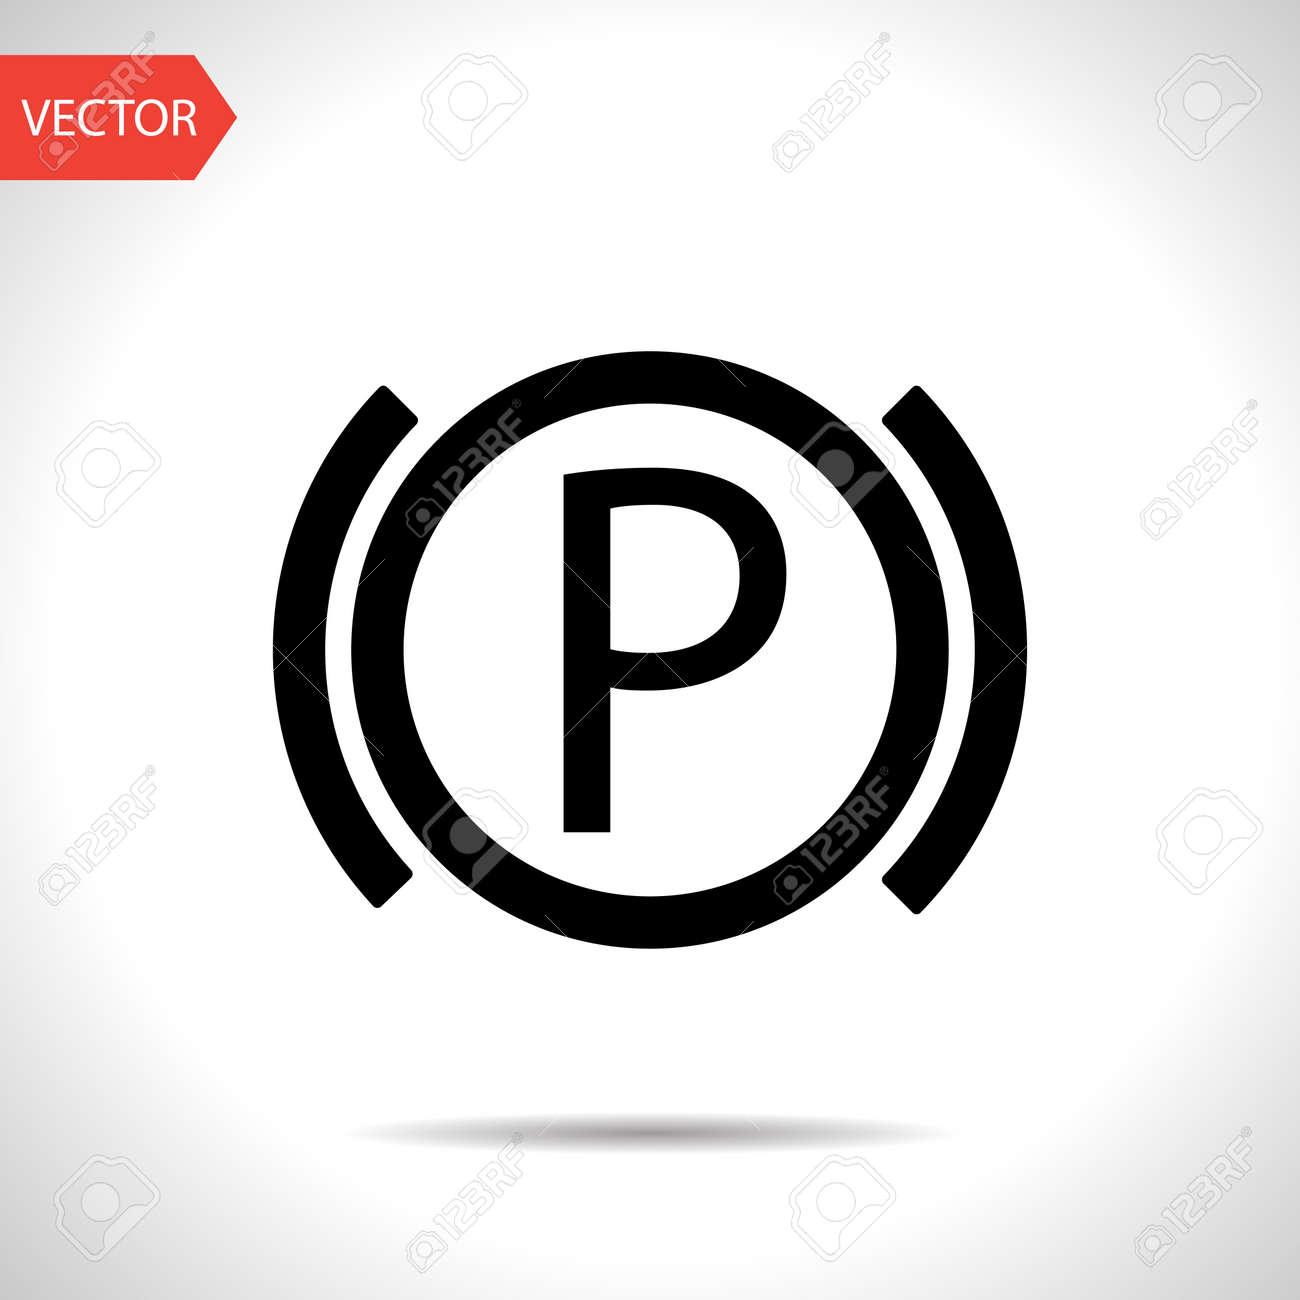 Car Parking Brake Warning Vector Hmi Dashboard Flat Icon Royalty - Car image sign of dashboardcar dashboard icons stock images royaltyfree imagesvectors